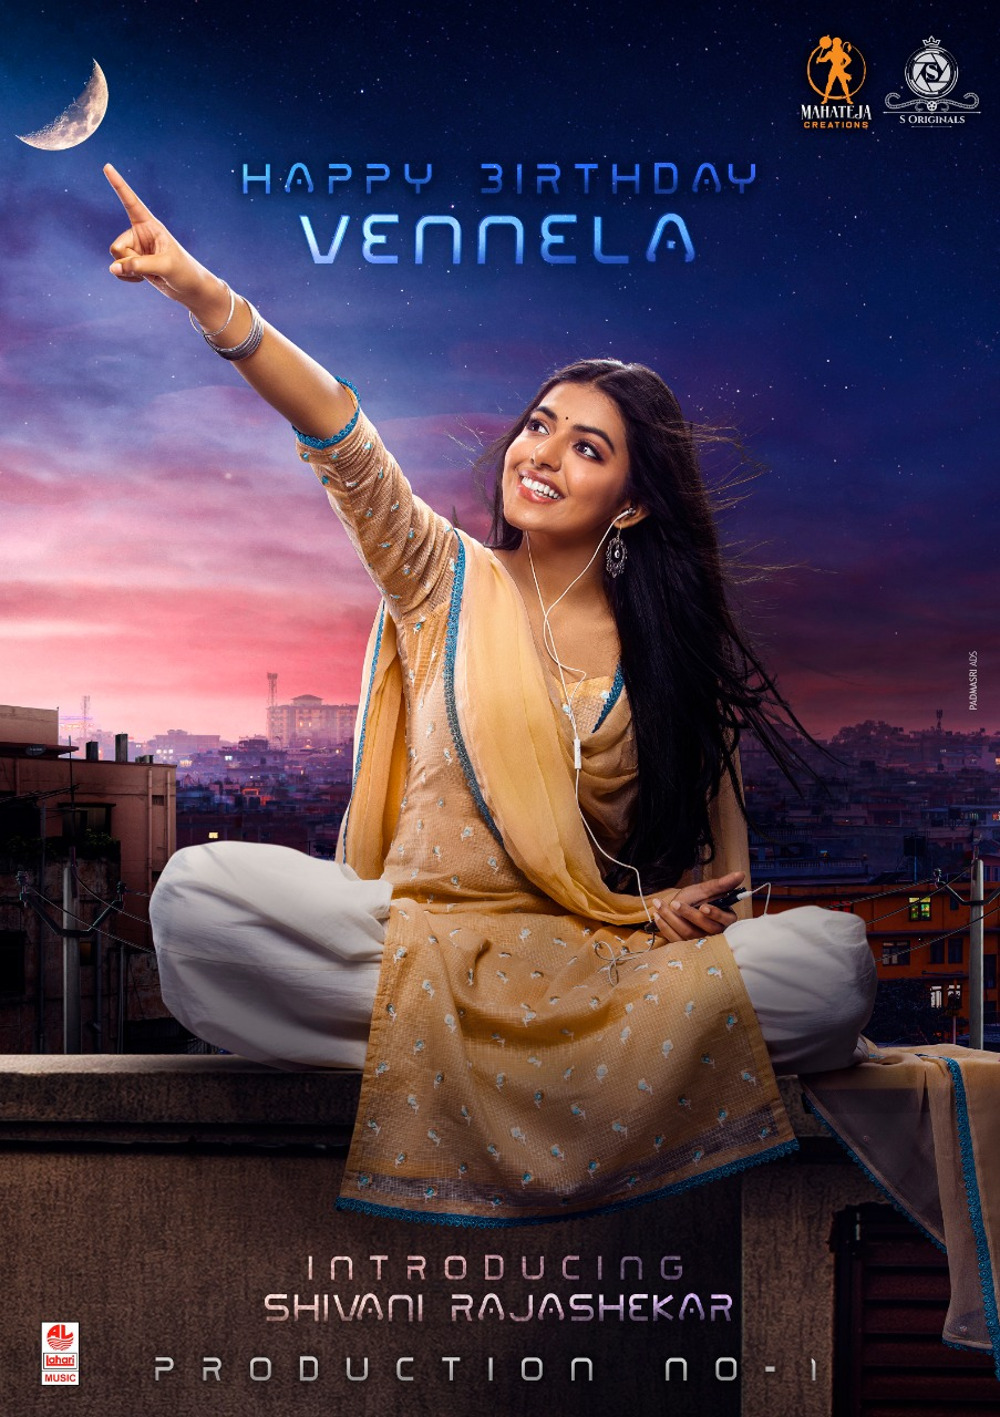 Actress Shivani Rajasekhar Vennela look poster